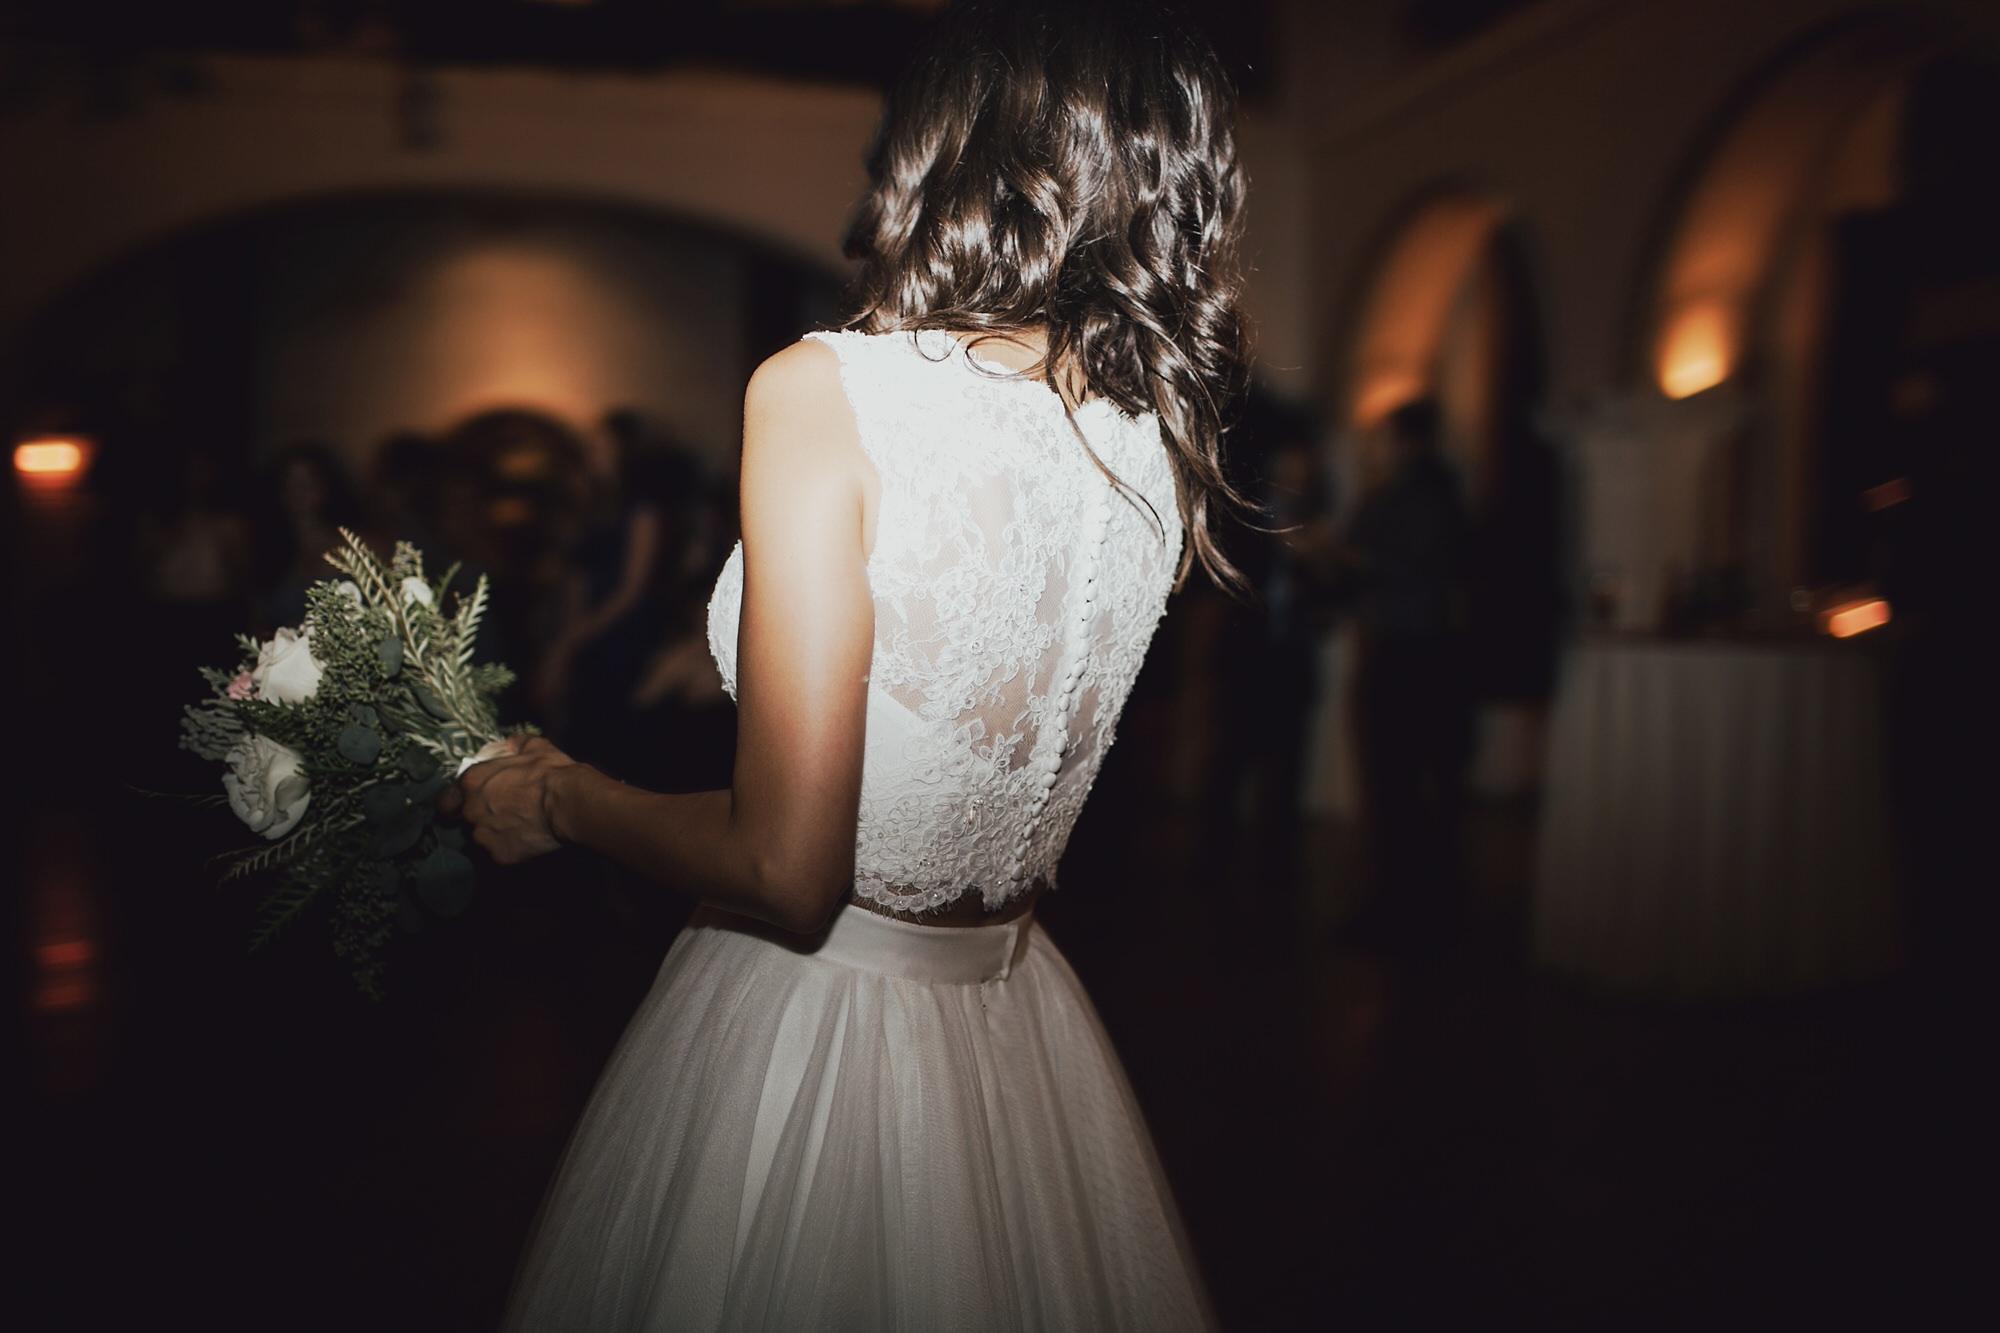 christine-ken-ebell-long-beach-wedding-124.jpg